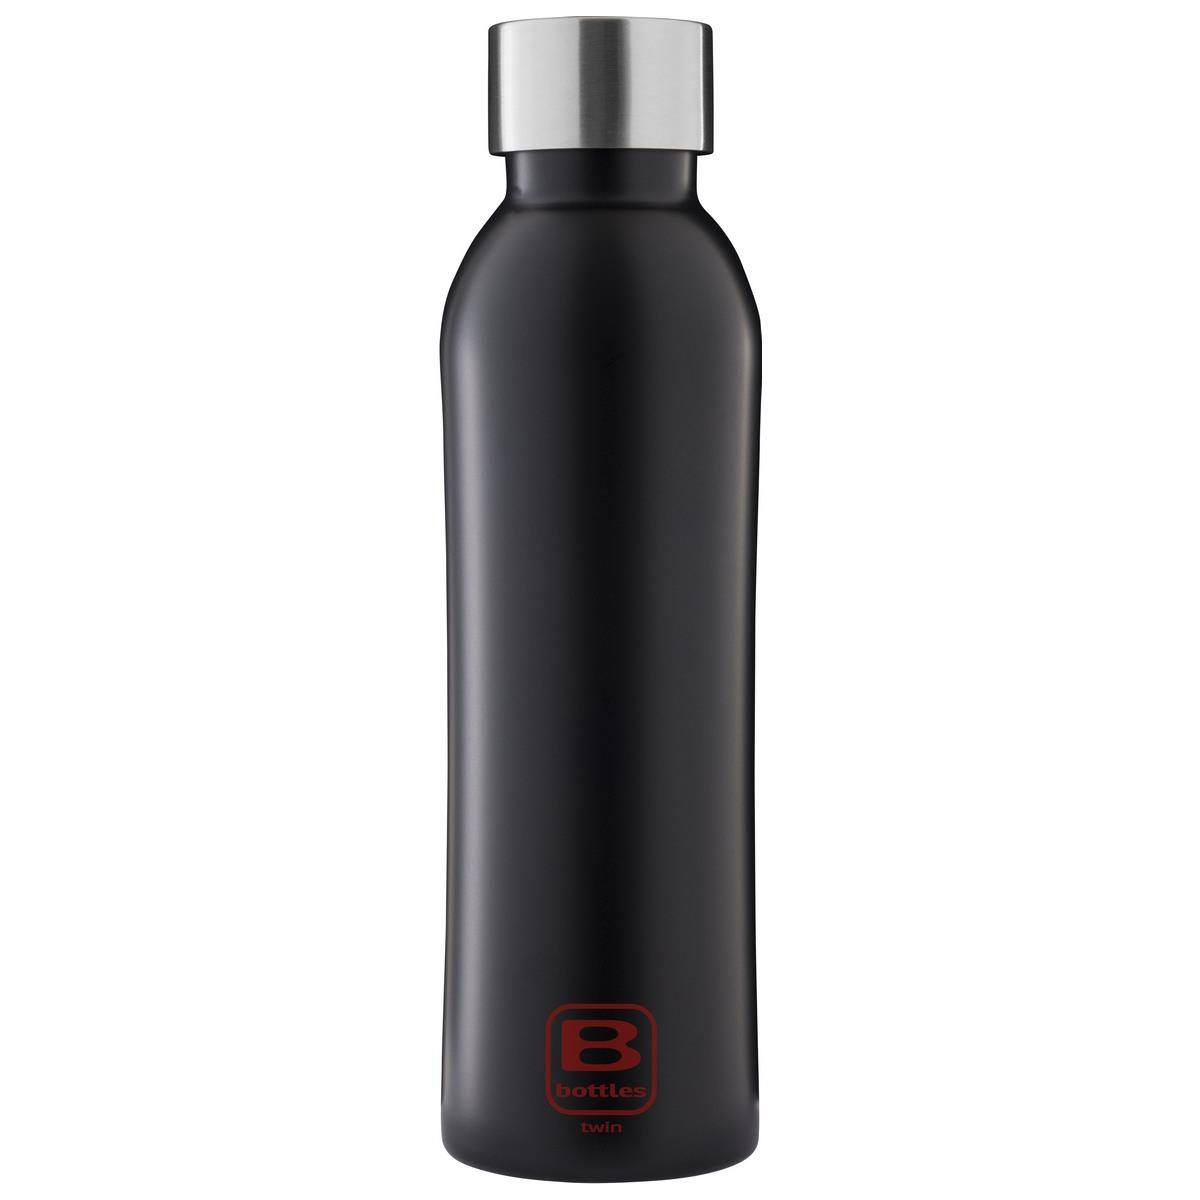 B Bottles Twin - Nero Opaco - 500 ml - Bottiglia Termica a doppia parete in acciaio inox 18/10